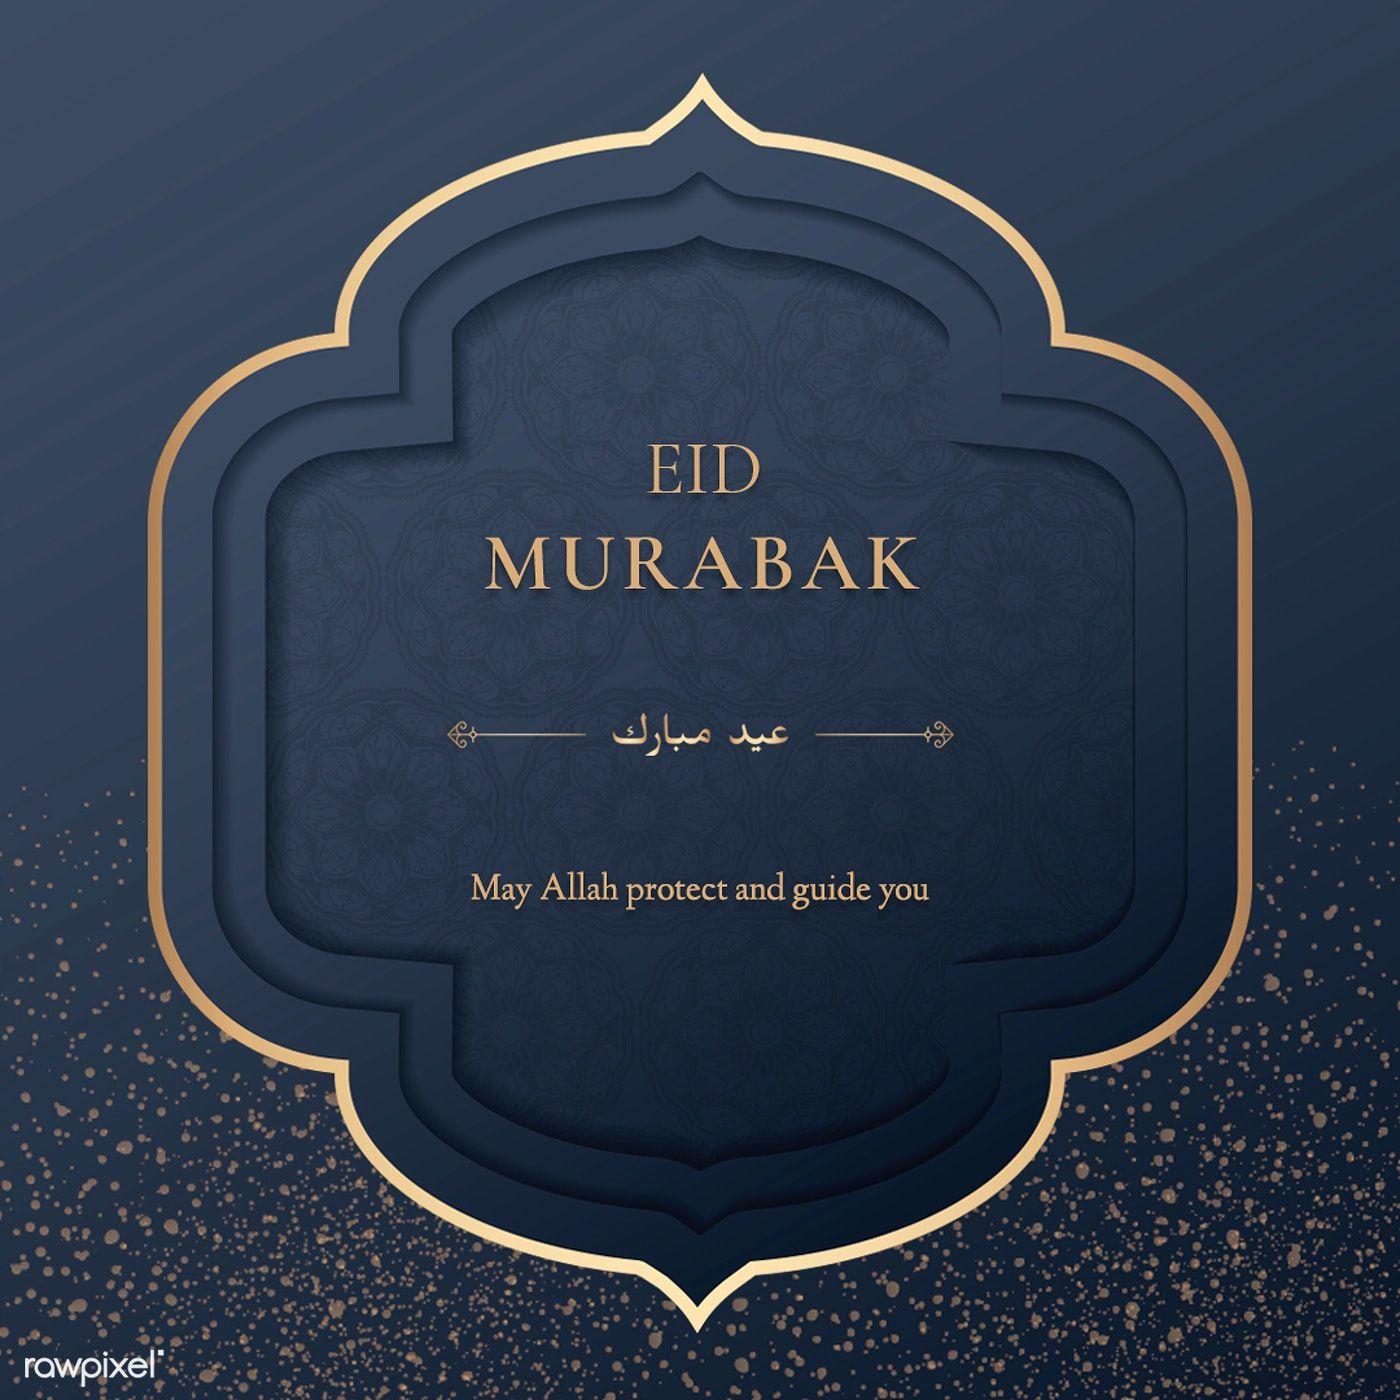 Download Premium Illustration Of Festive Eid Mubarak Greeting Card Eid Mubarak Greeting Cards Eid Mubarak Greetings Eid Greetings